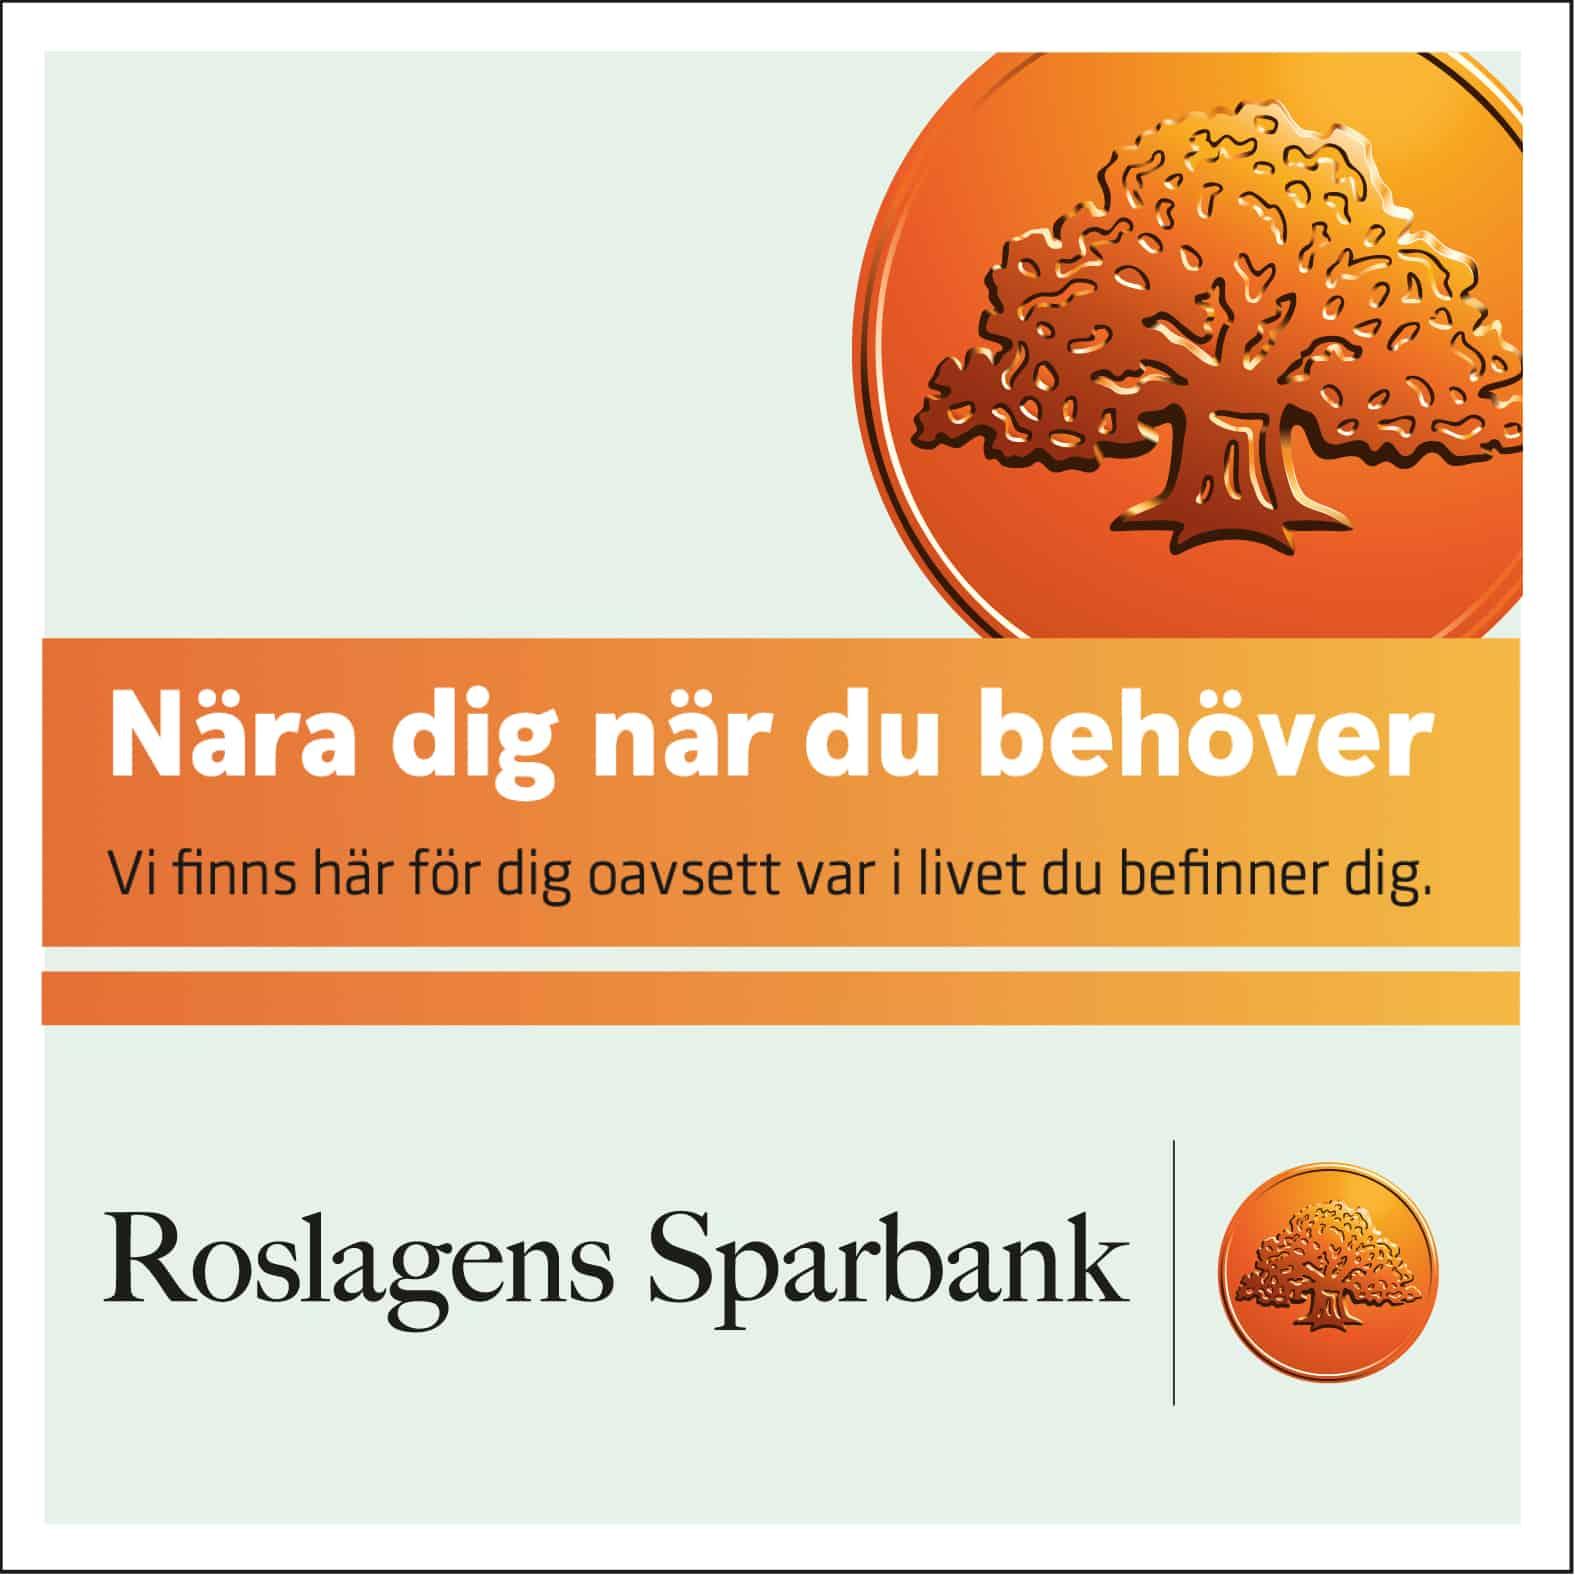 roslagenssparbank_2021